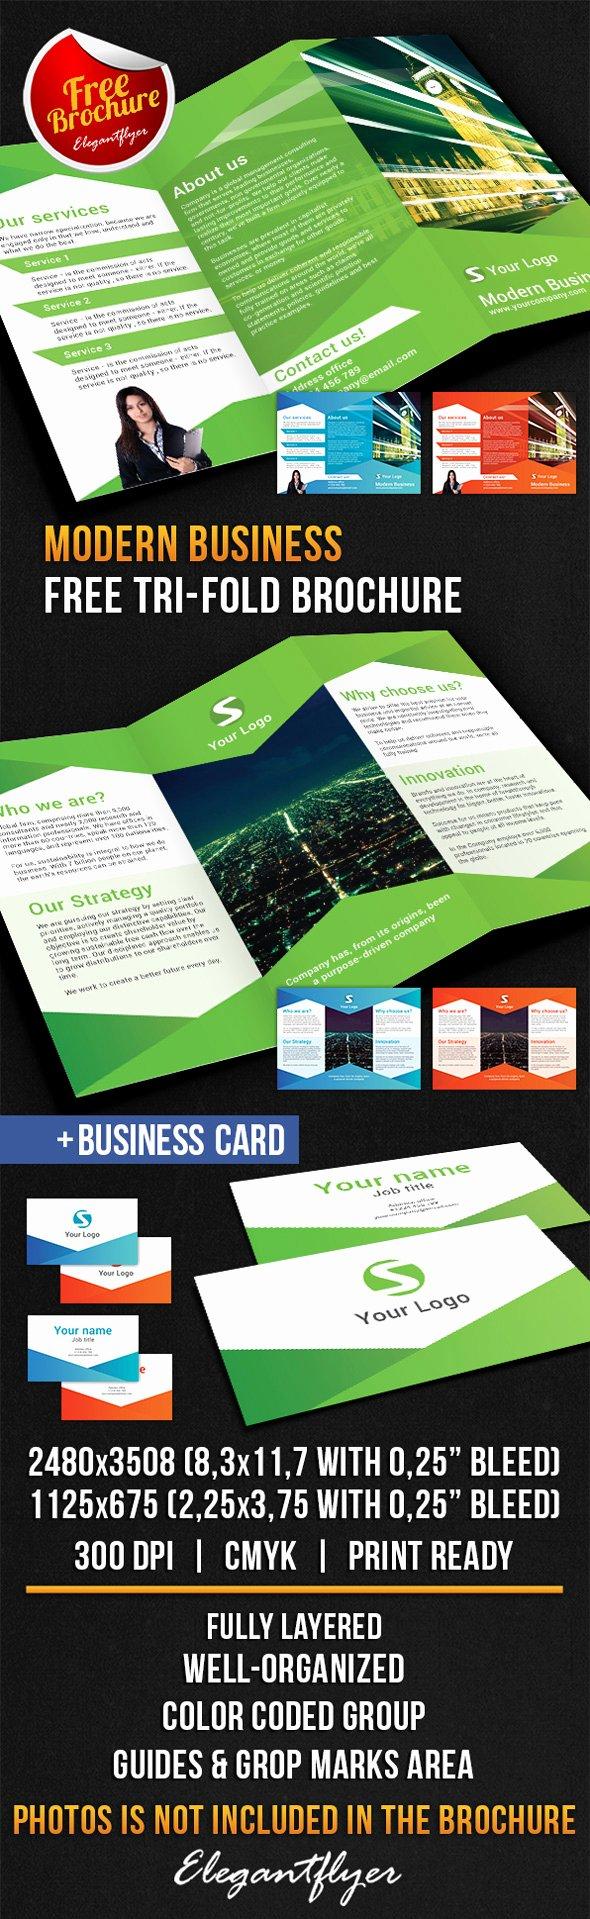 Tri Fold Brochure Free Template Elegant 25 Best Free Psd Brochure Templates